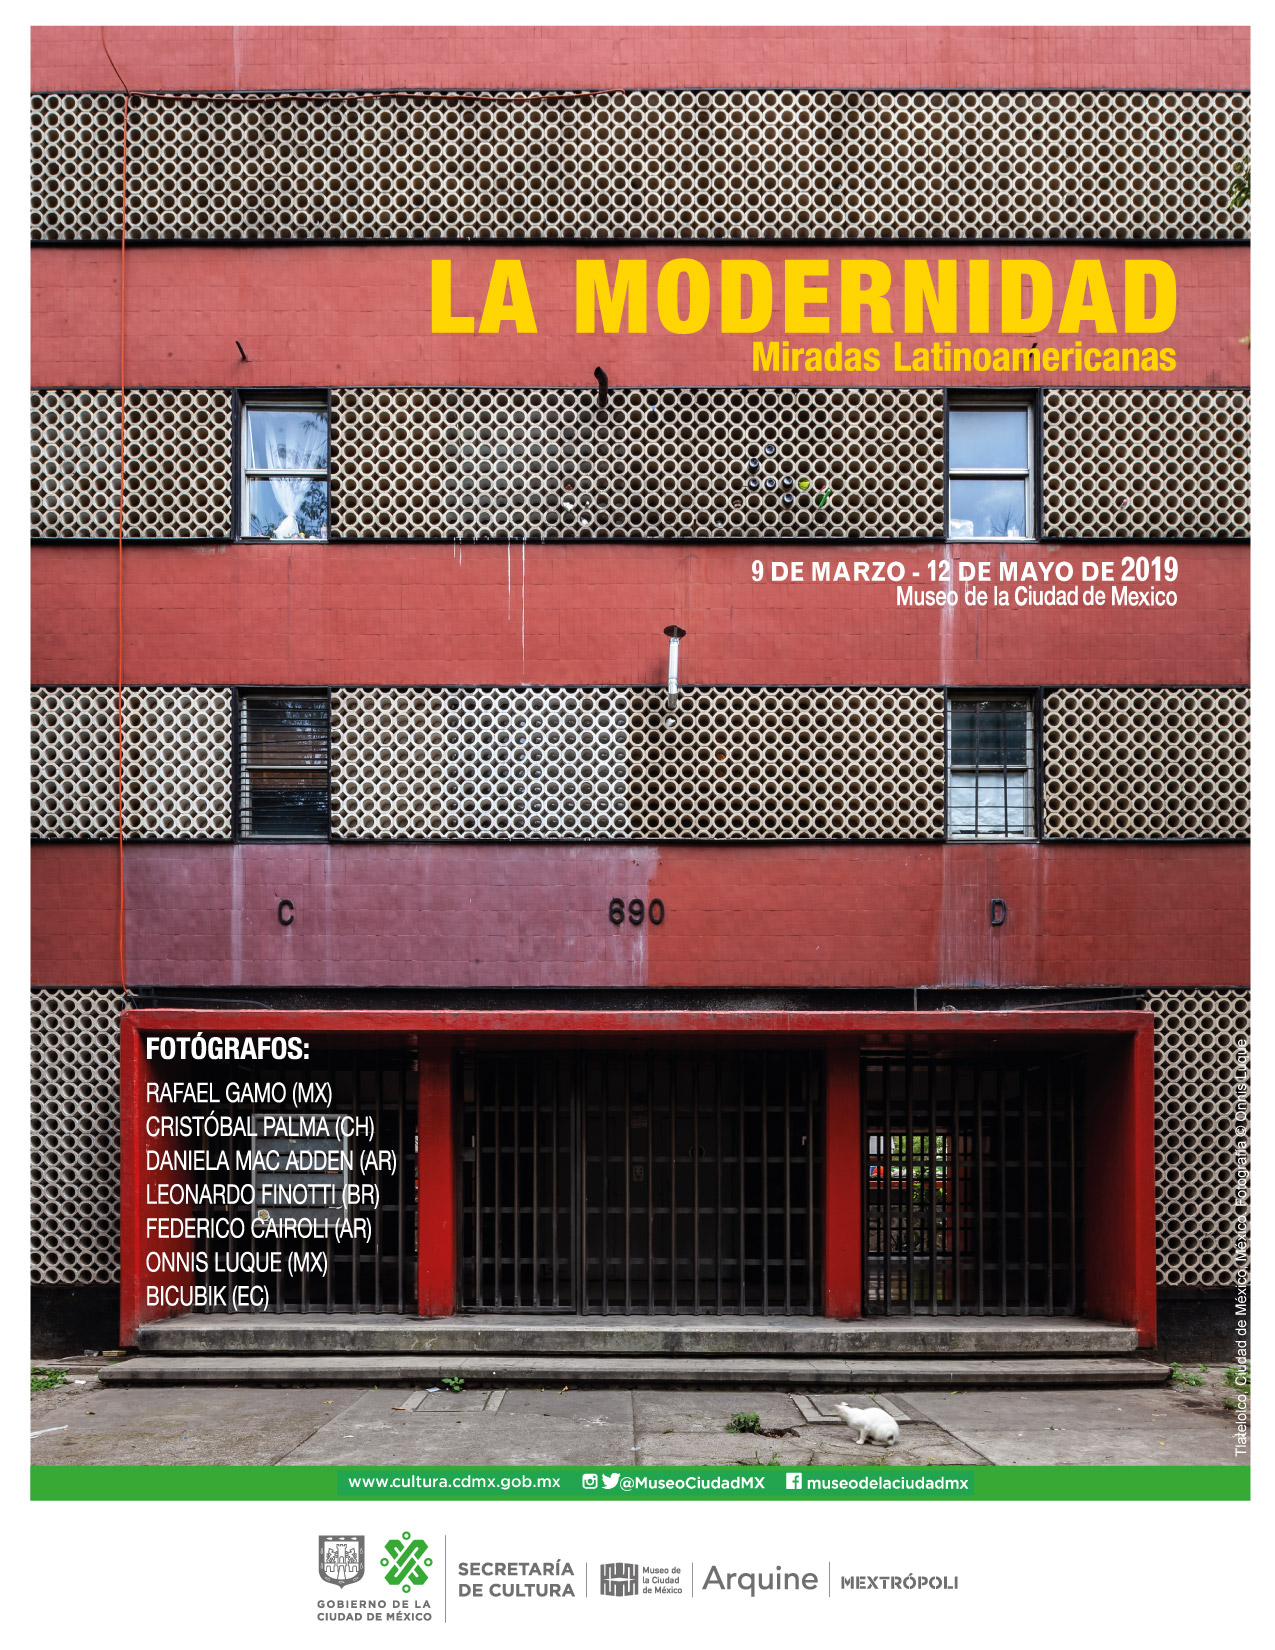 La modernidad. Miradas latinoamericanas